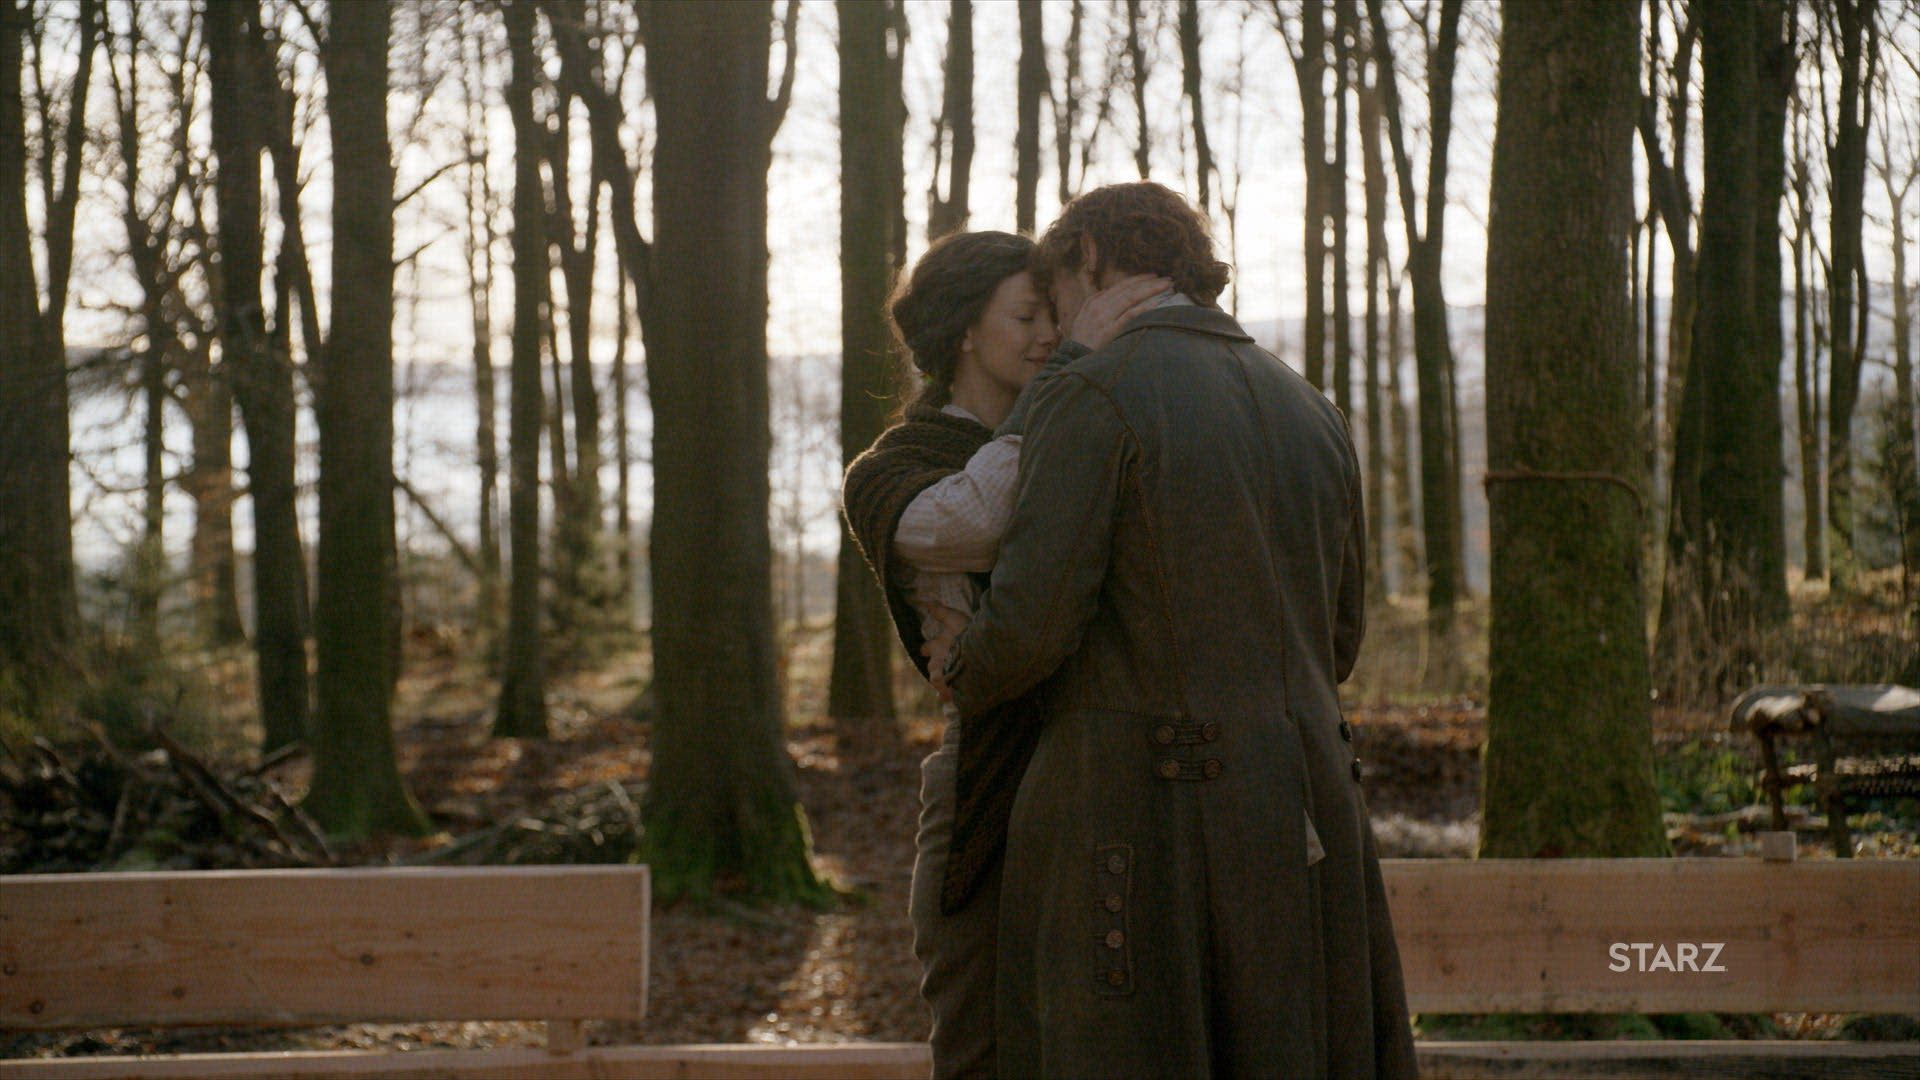 Outlander's Caitriona Balfe Reportedly Got Married in a Secret Wedding Last Weekend